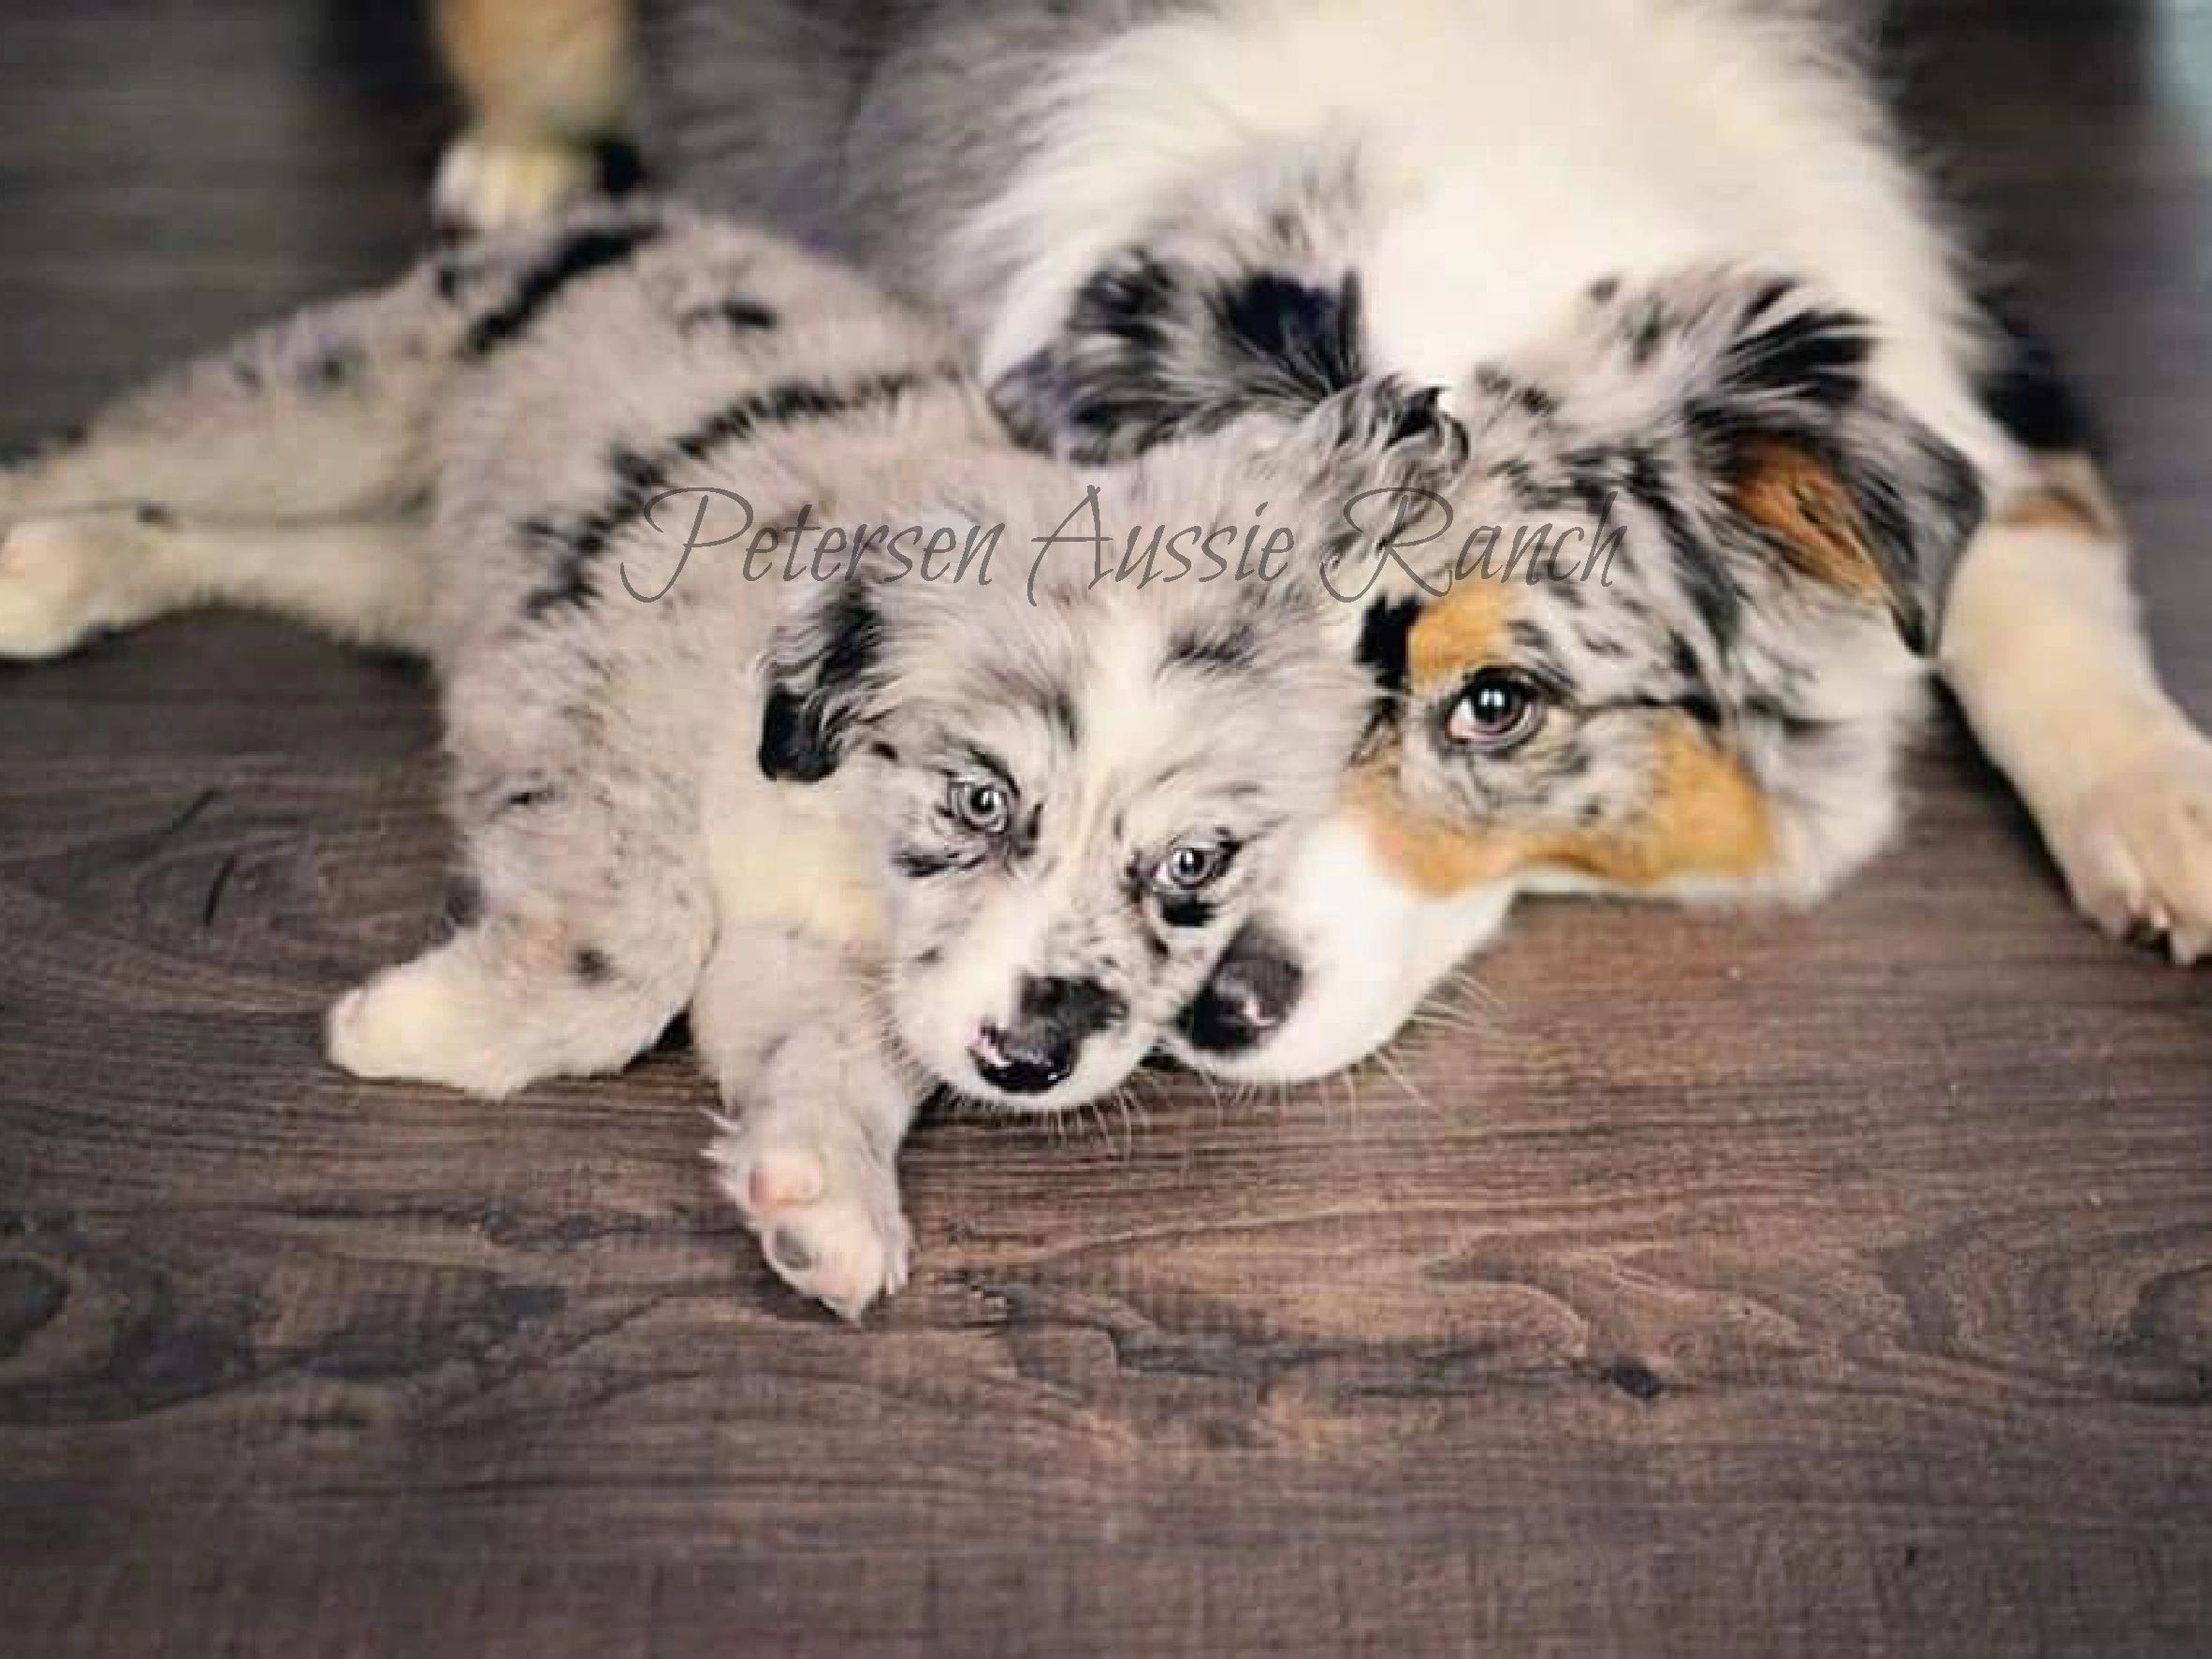 Petersen Aussie Ranch Mini Australian Shepherd Puppies